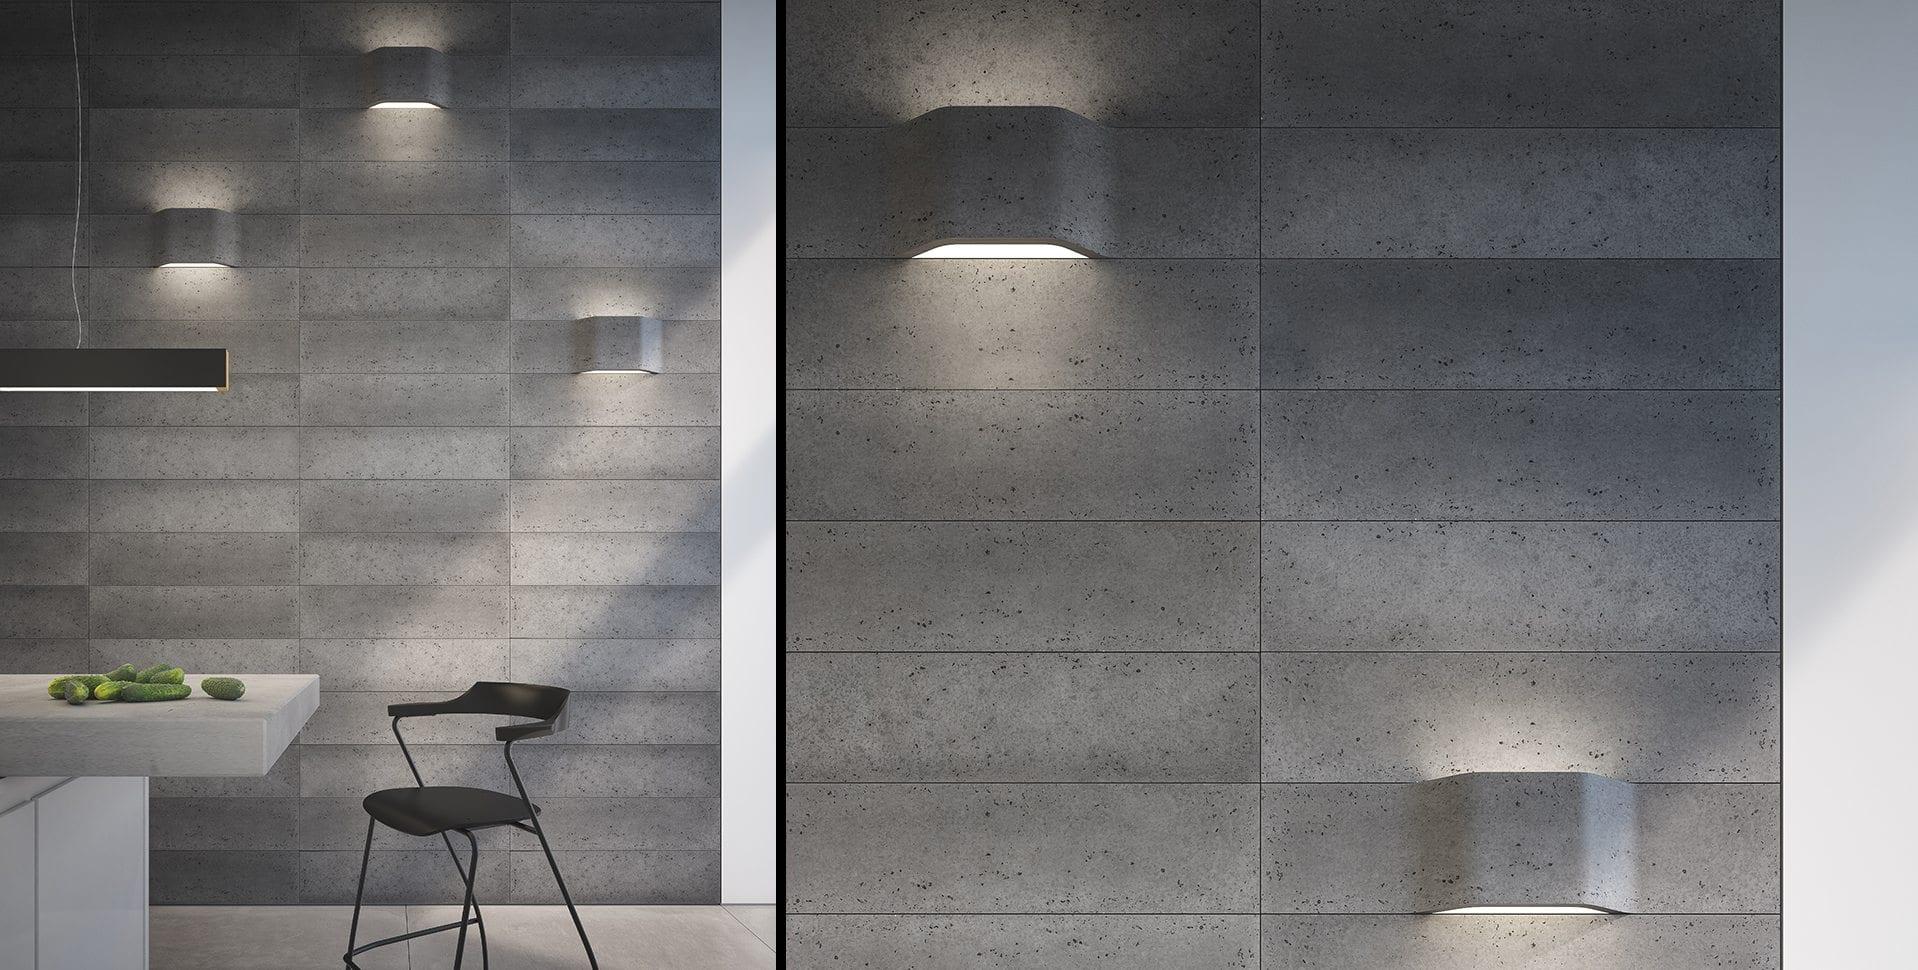 Maayan-Golan_Architectural-Visualization_product-visualization_wall-tiles_lighting-fixture_itai-bar-on_kitchen_03